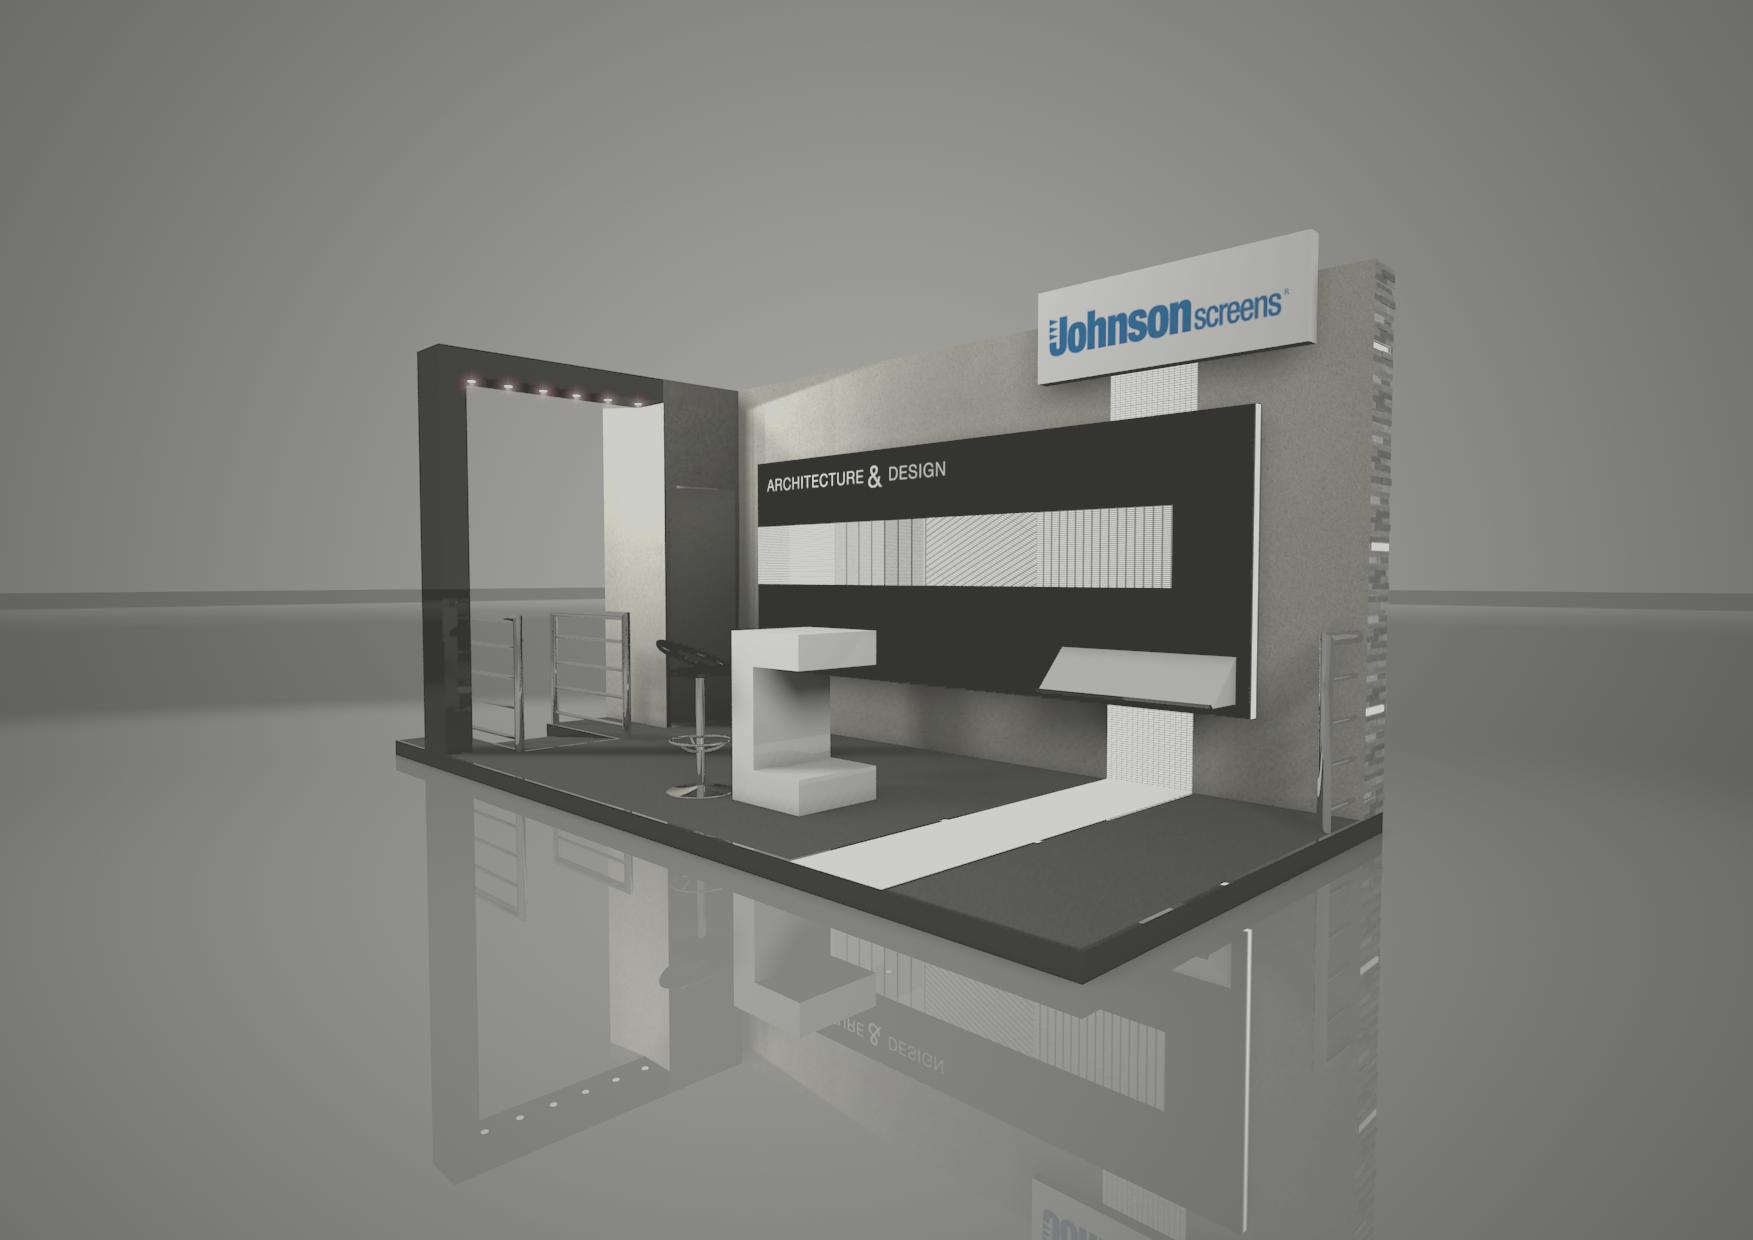 Exhibition Stand In Uk : Custom exhibition stands uk matix